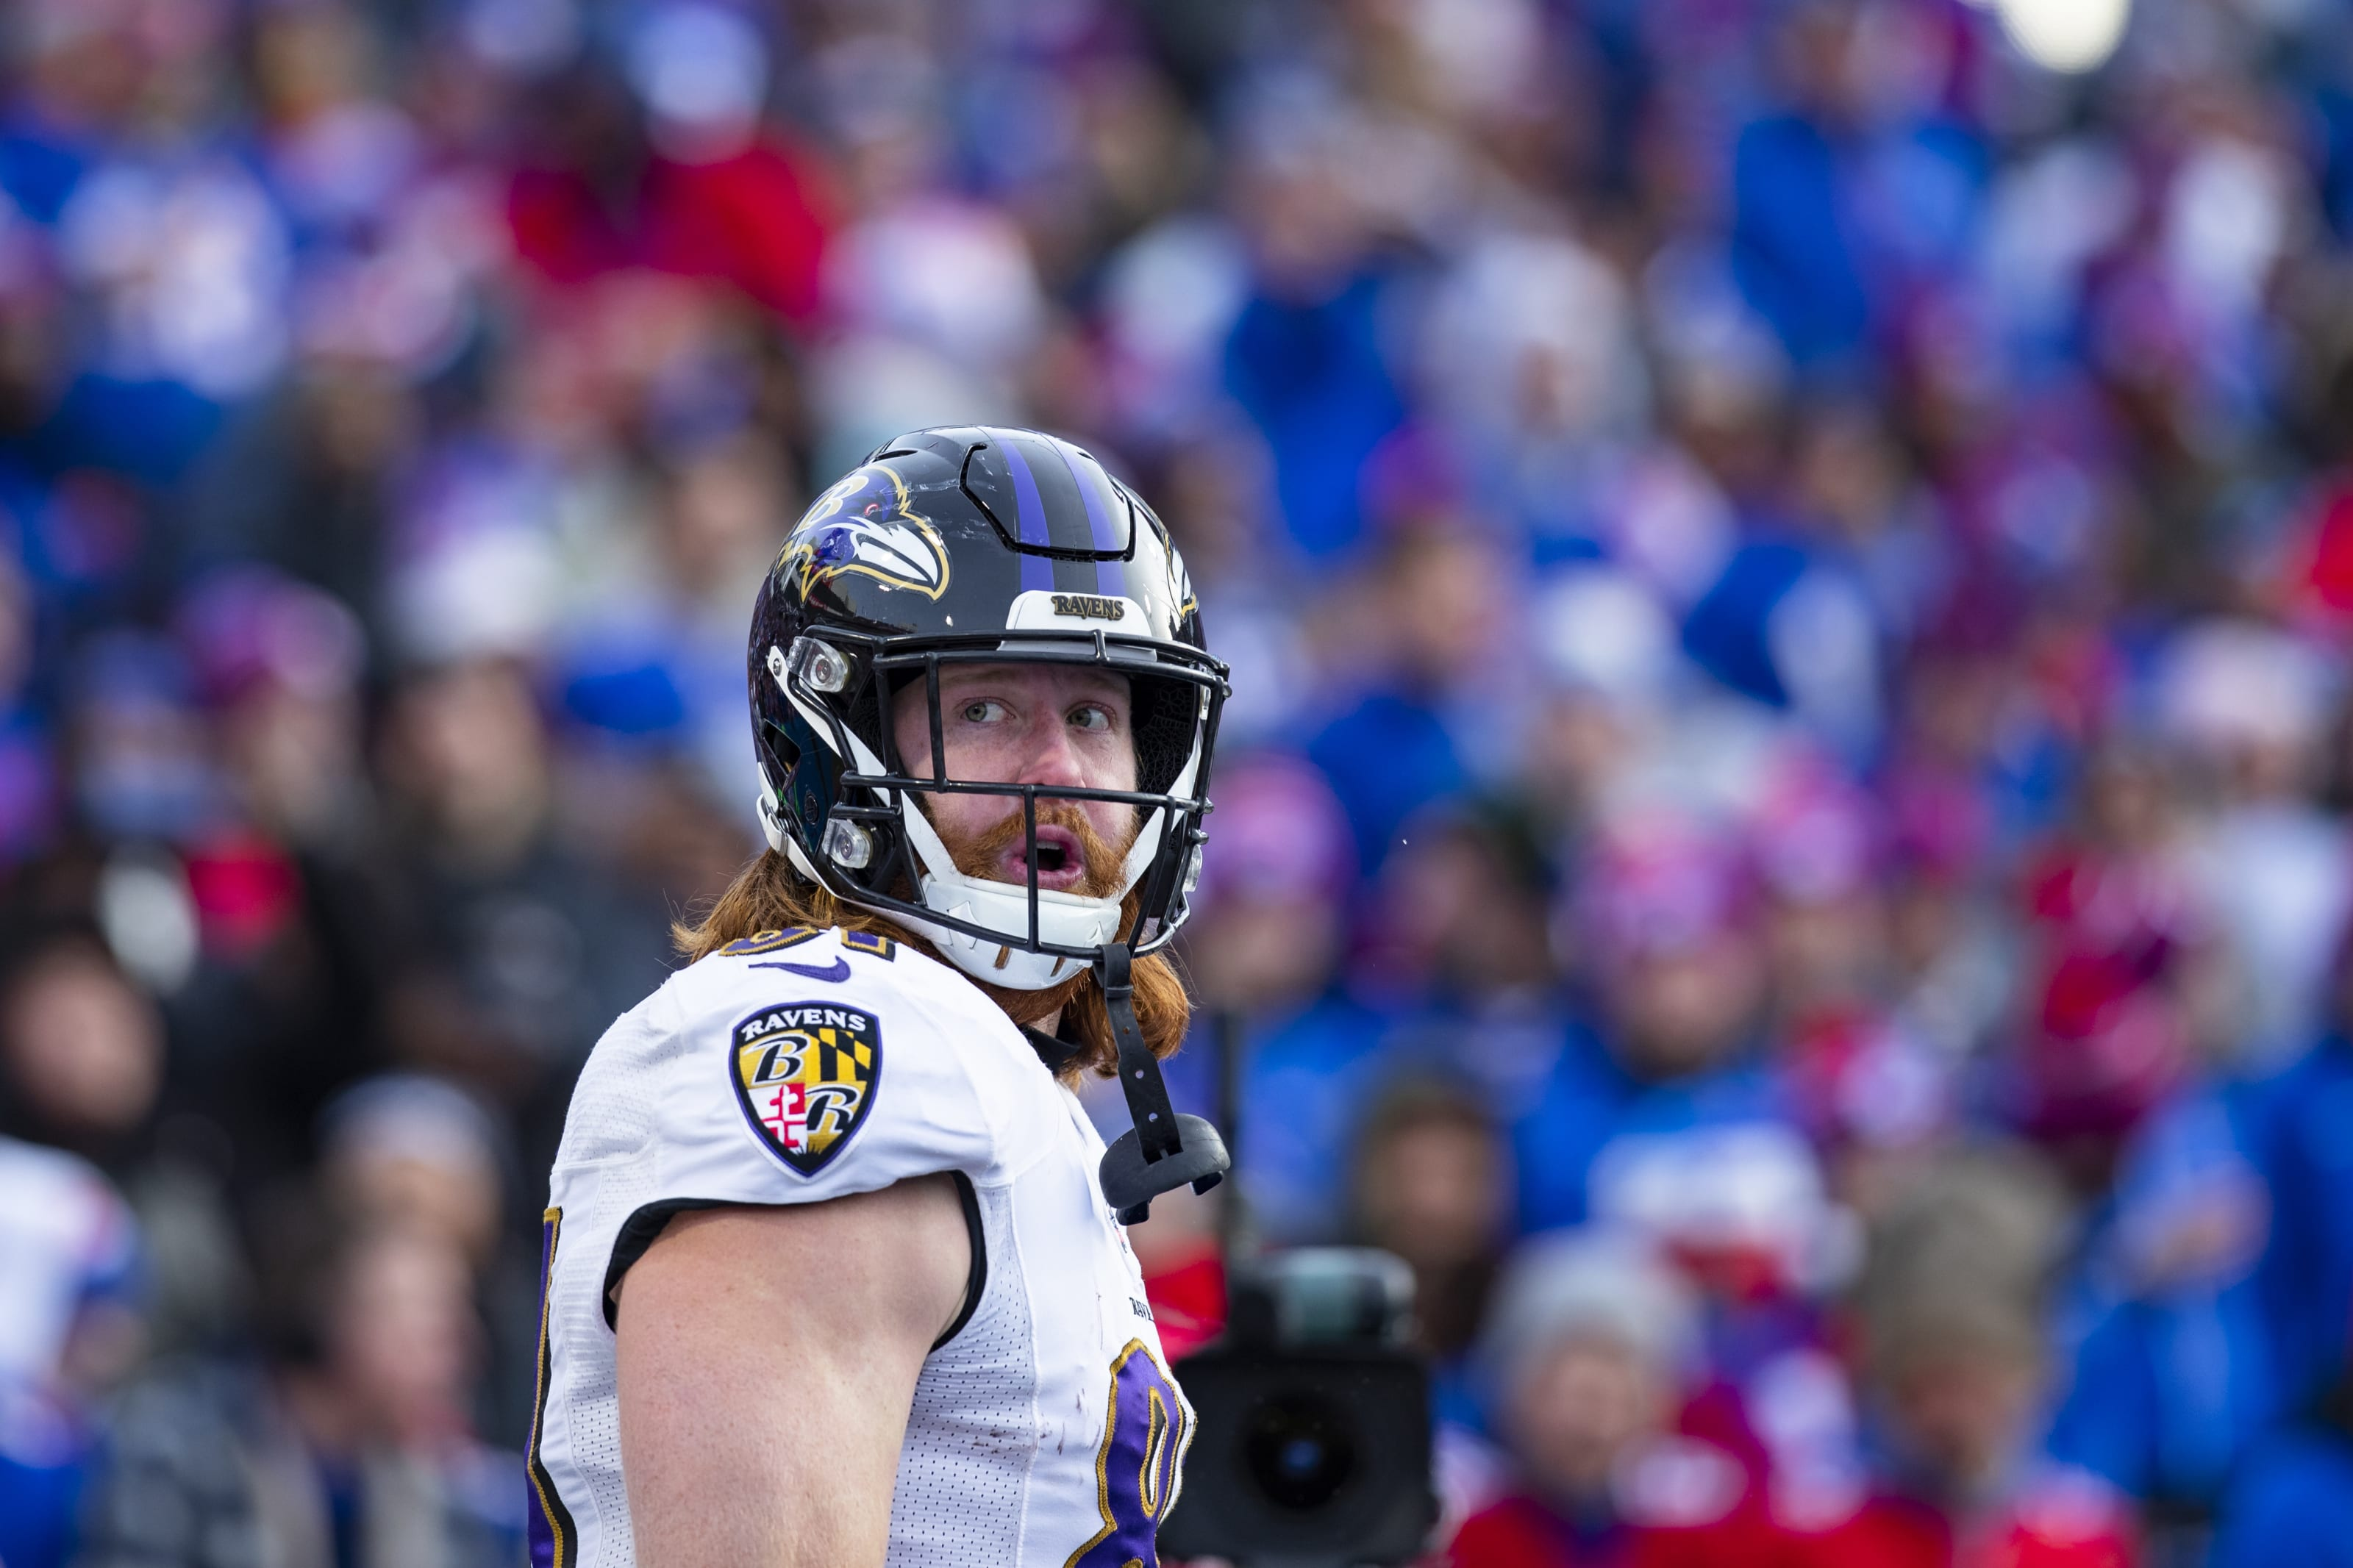 Should the Ravens trade Hayden Hurst during the off-season?